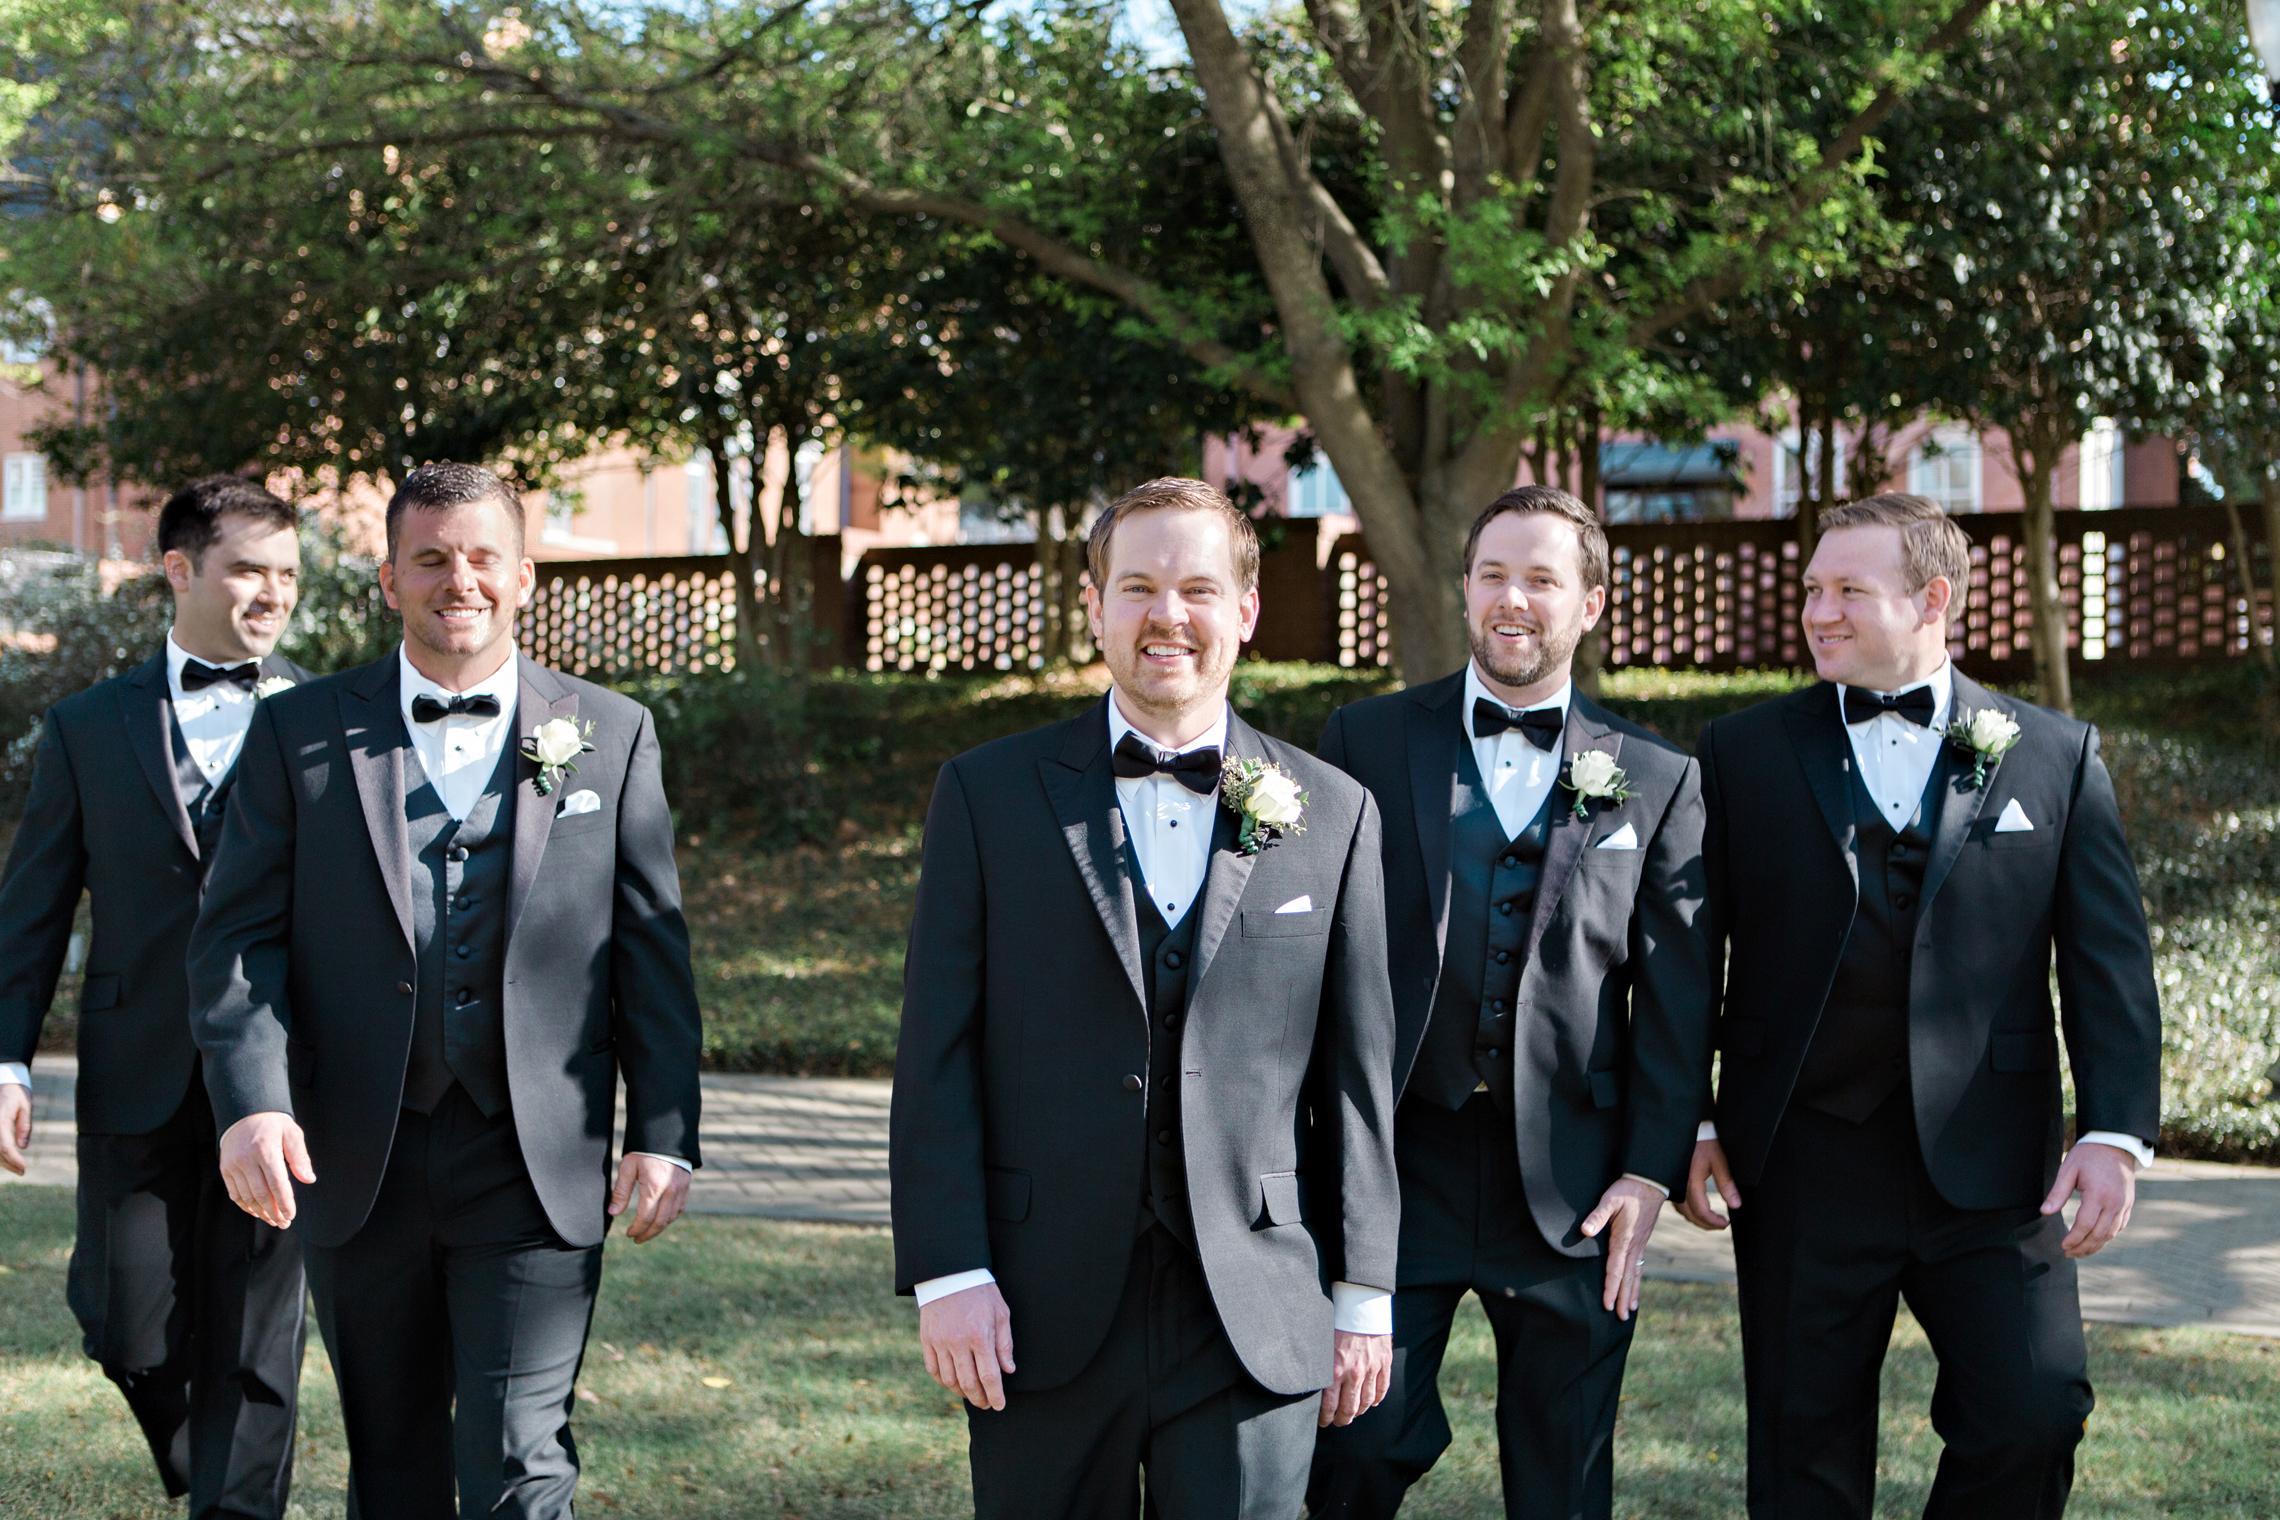 Matty-Drollette-Photography-Weddings-Montgomery-Alabama-110.jpg